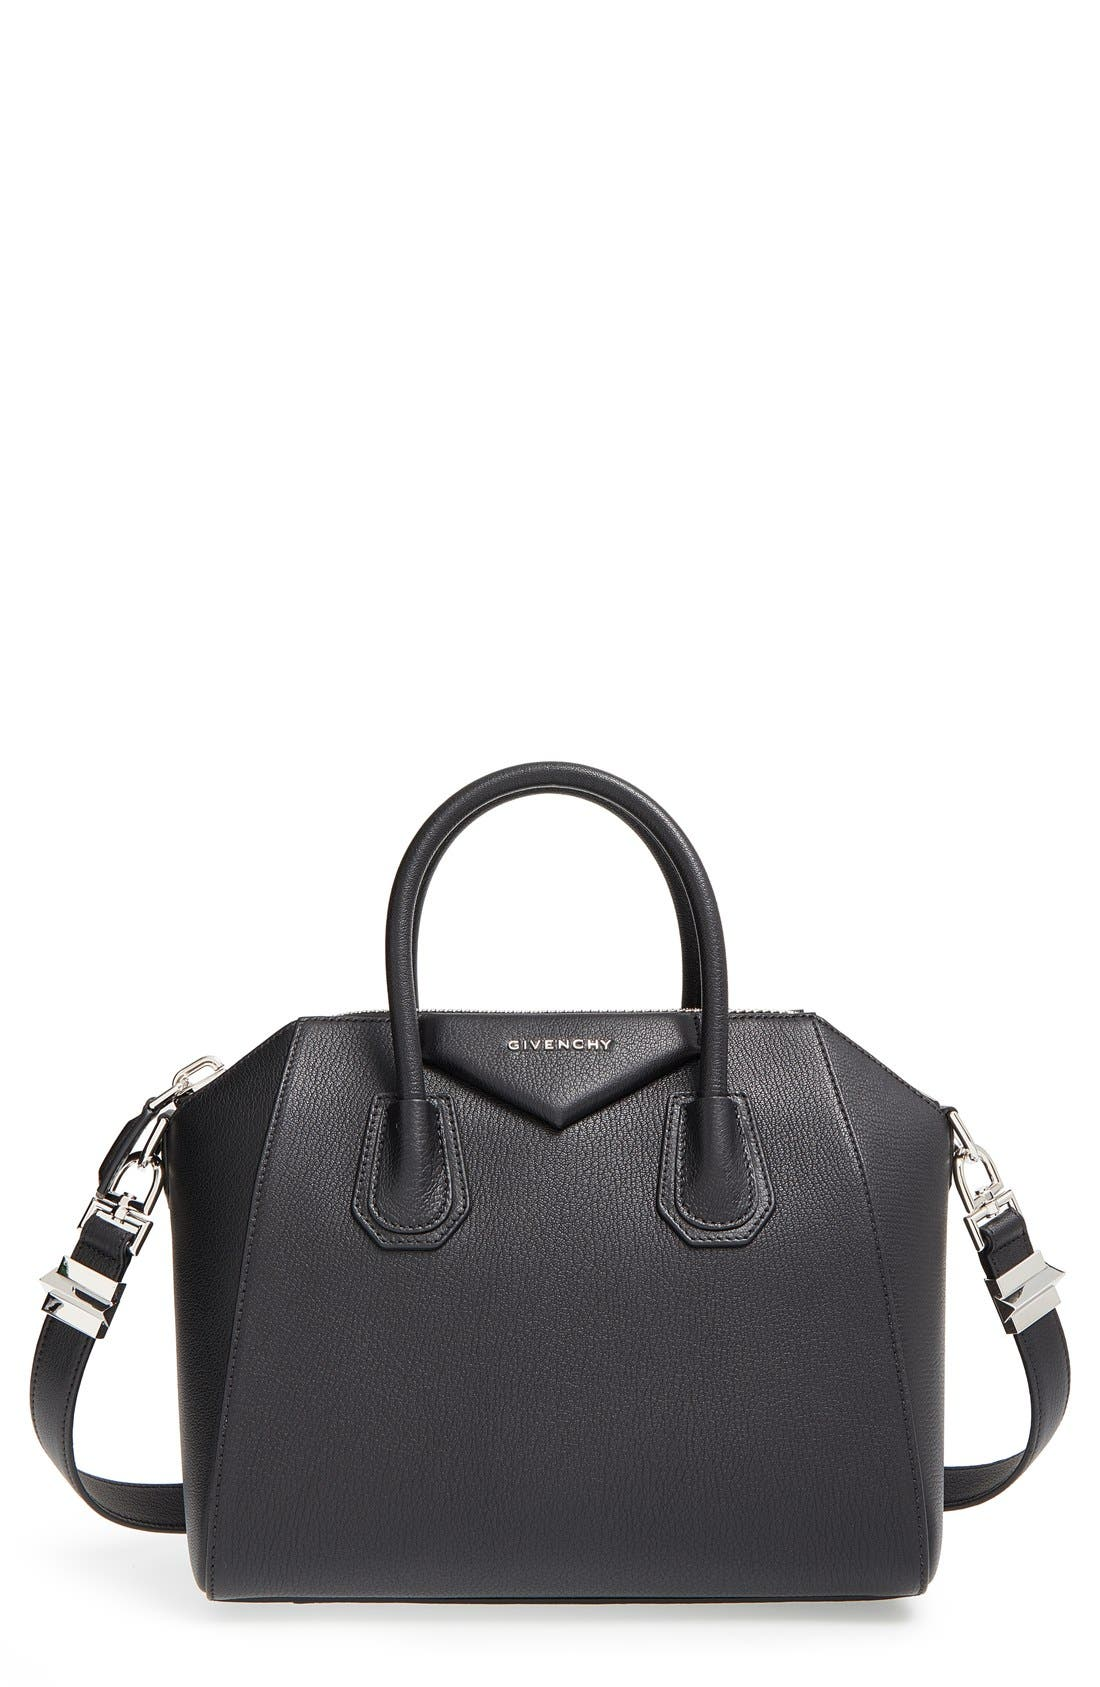 Alternate Image 1 Selected - Givenchy 'Small Antigona' Sugar Leather Satchel